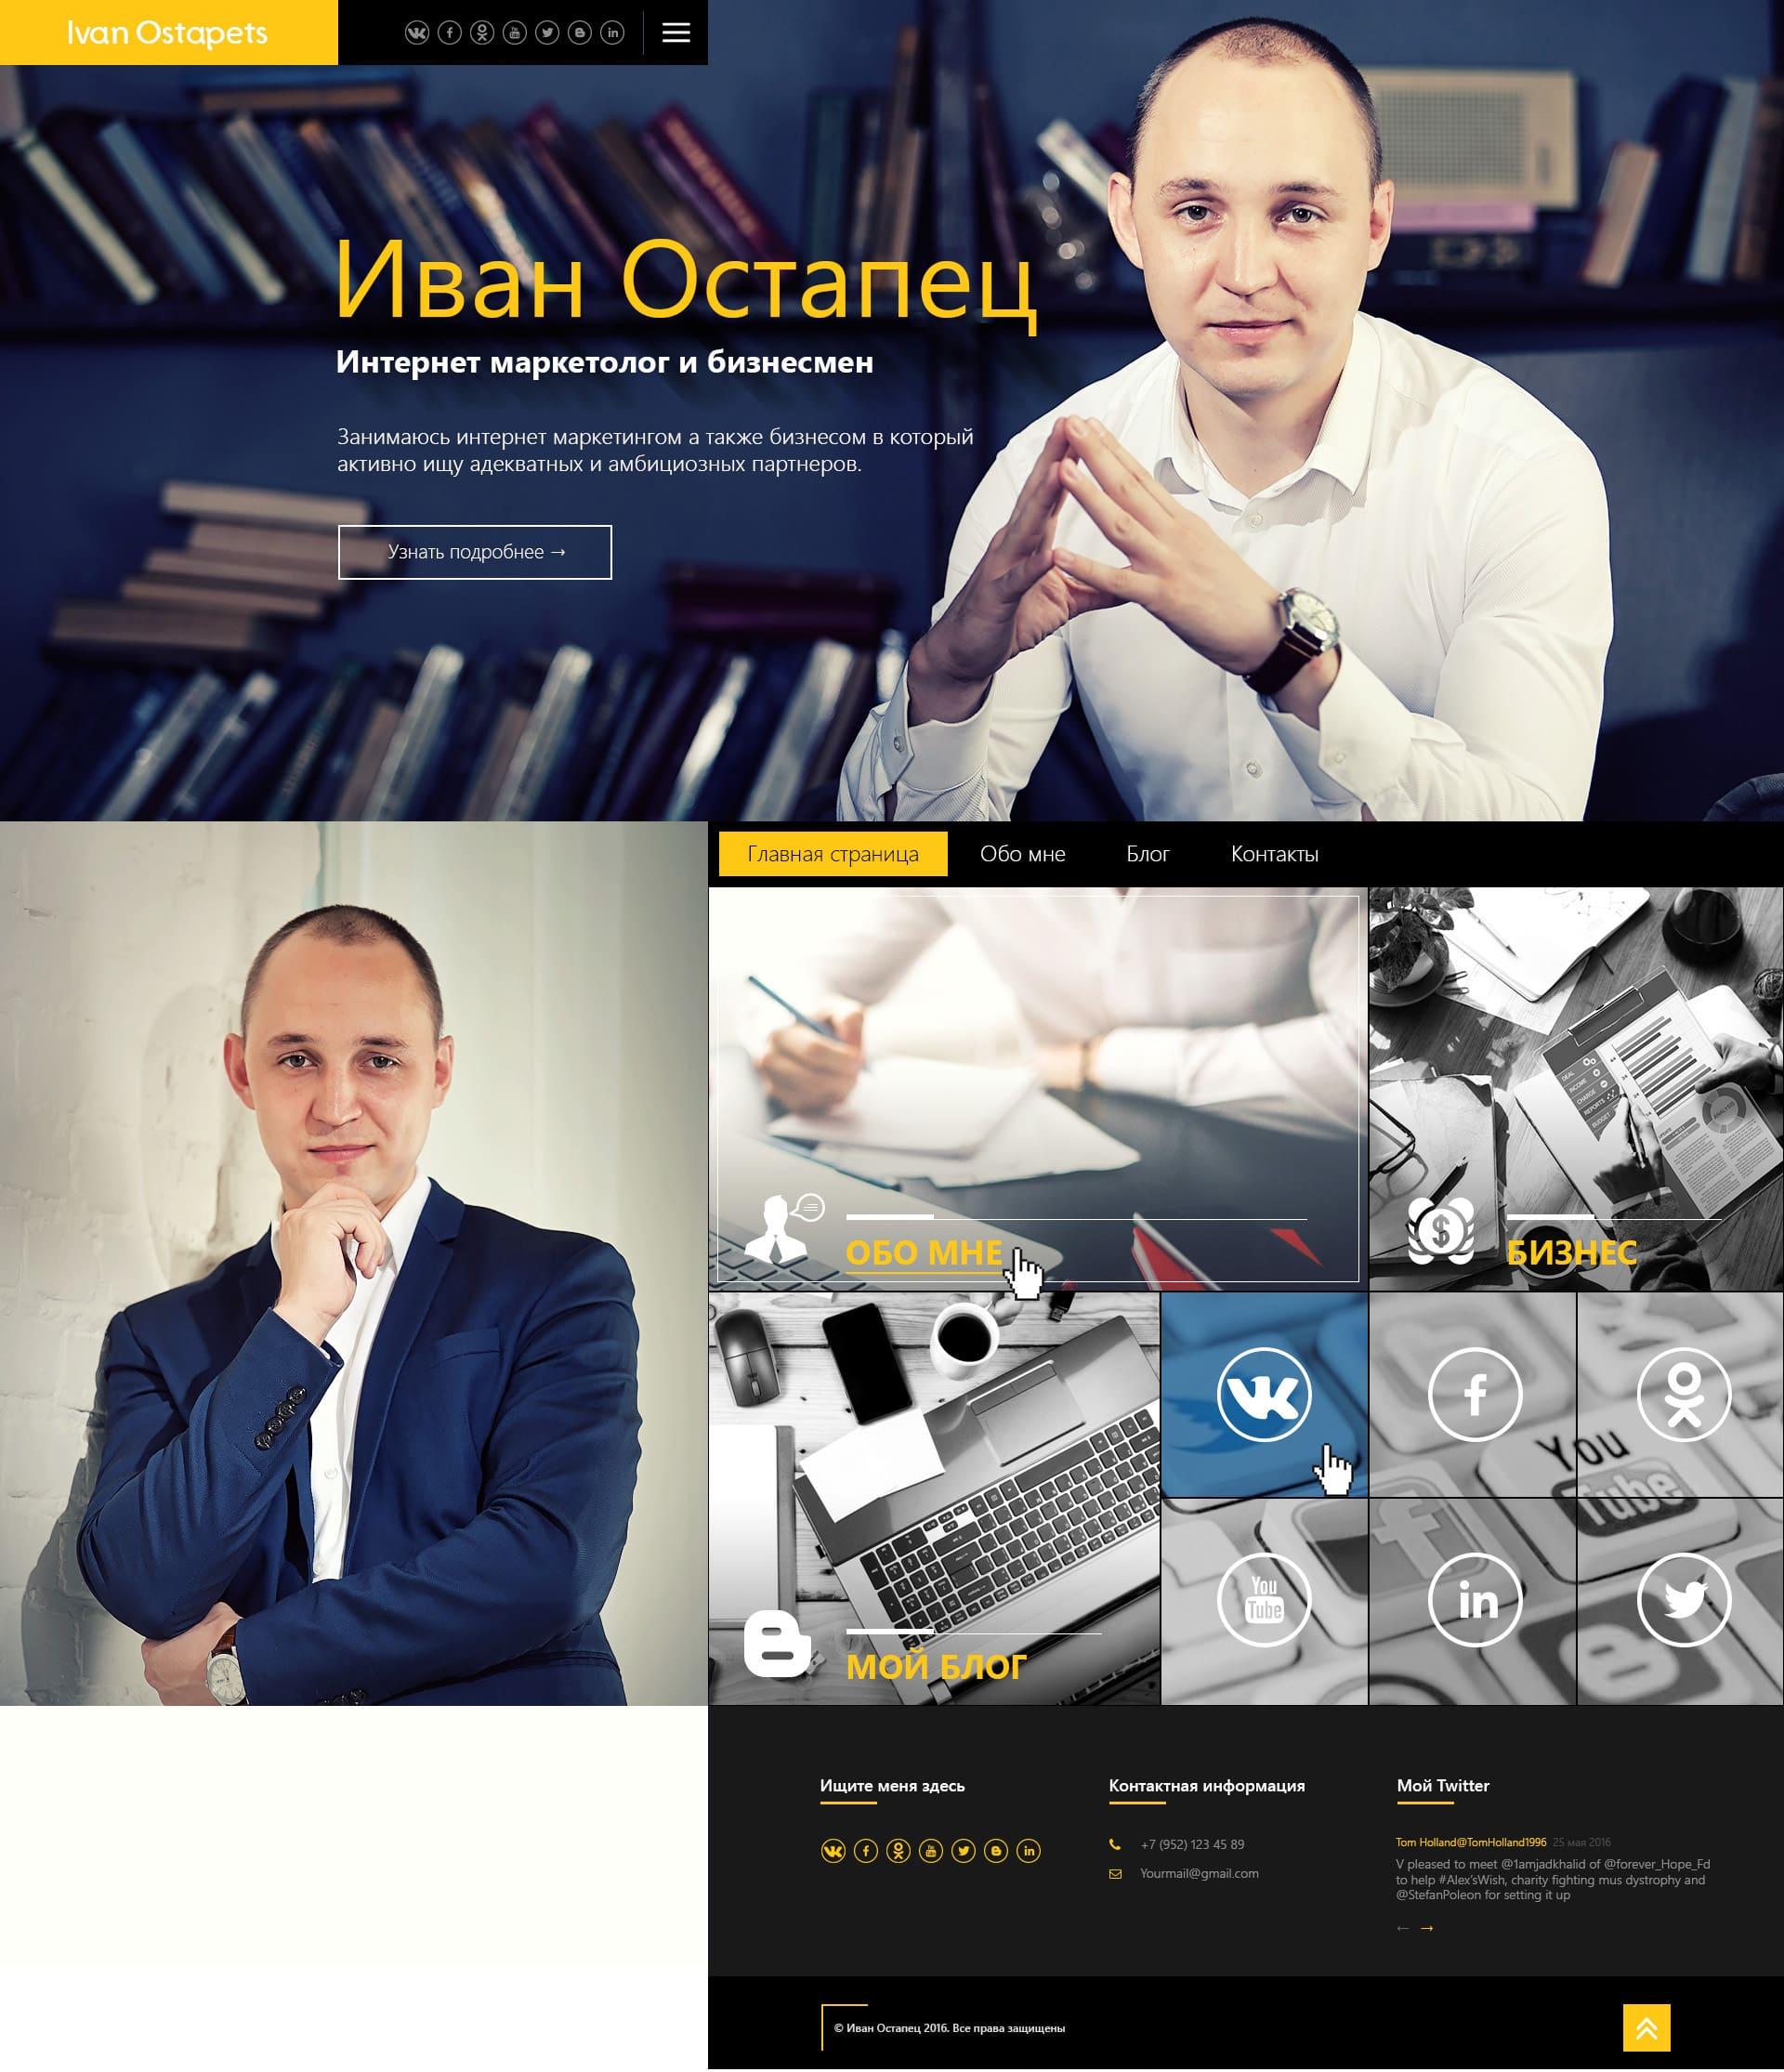 https://vladimir-alexandrov.com/wp-content/uploads/2017/10/site_IvanOstapetc_1-min.jpg